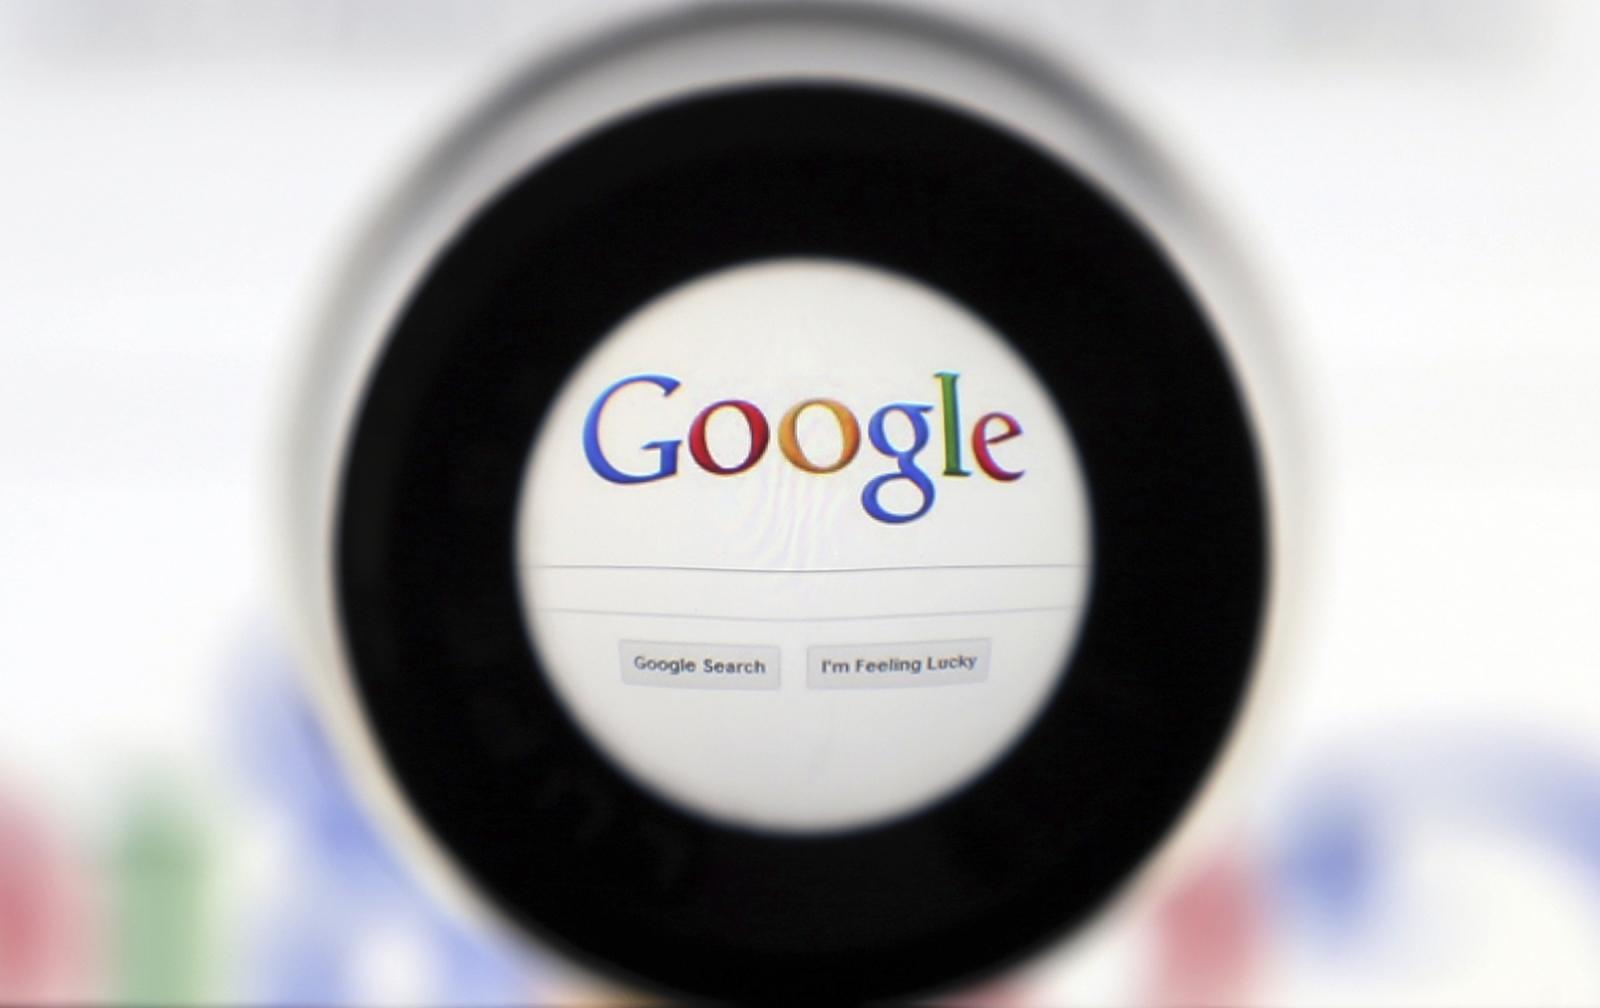 Vietnam says Google to remove toxic content